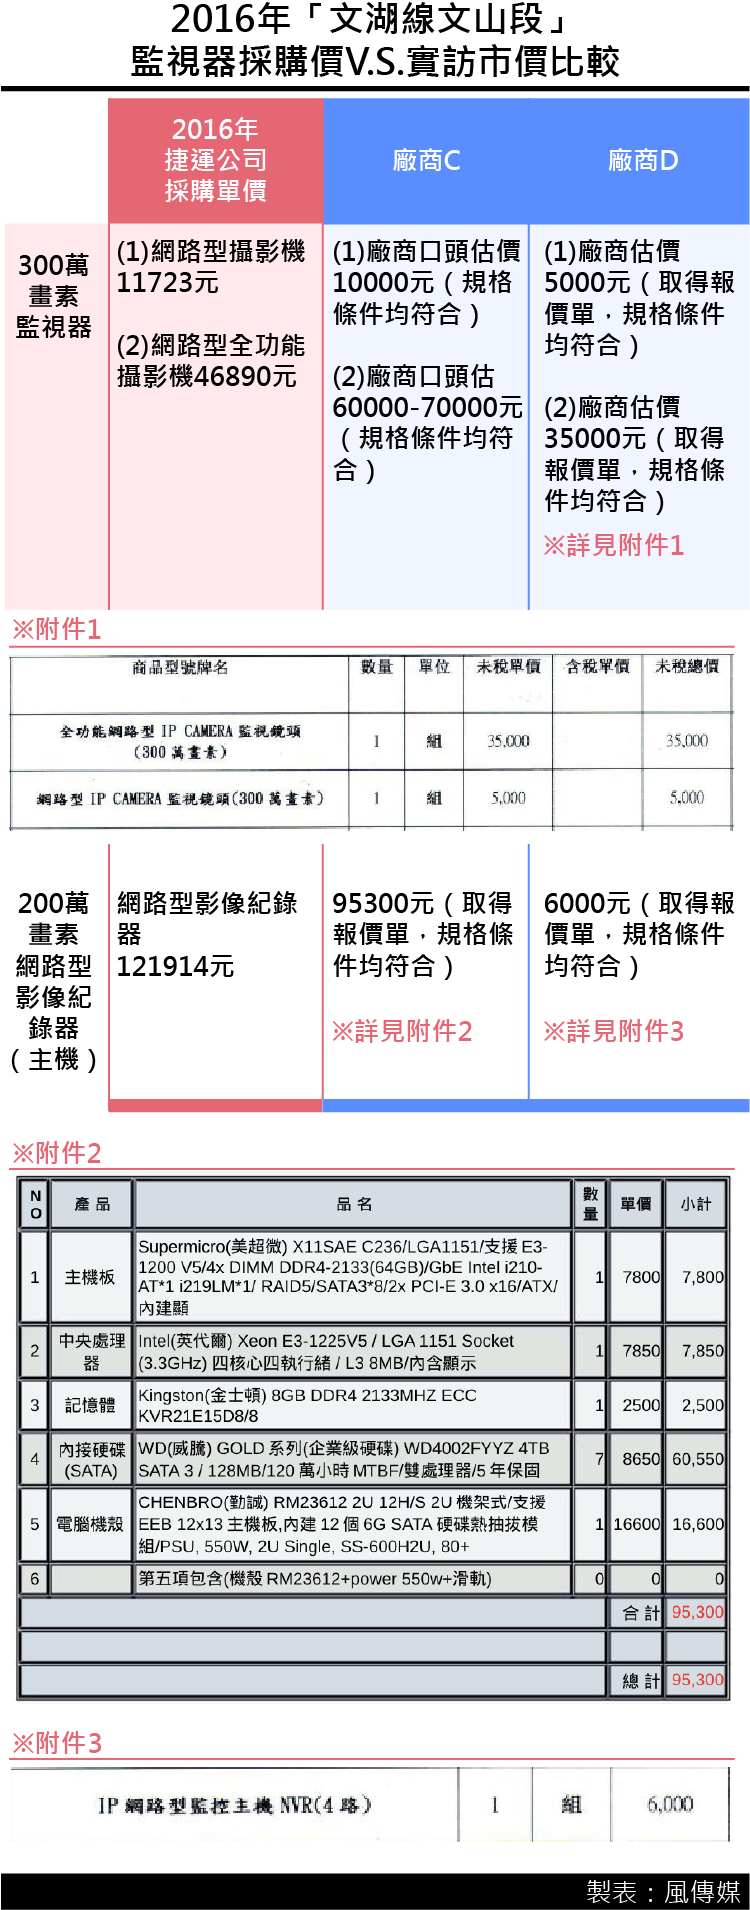 20161223-SMG0035-台北捷運公司採購監視器設備價格疑過高-01.png